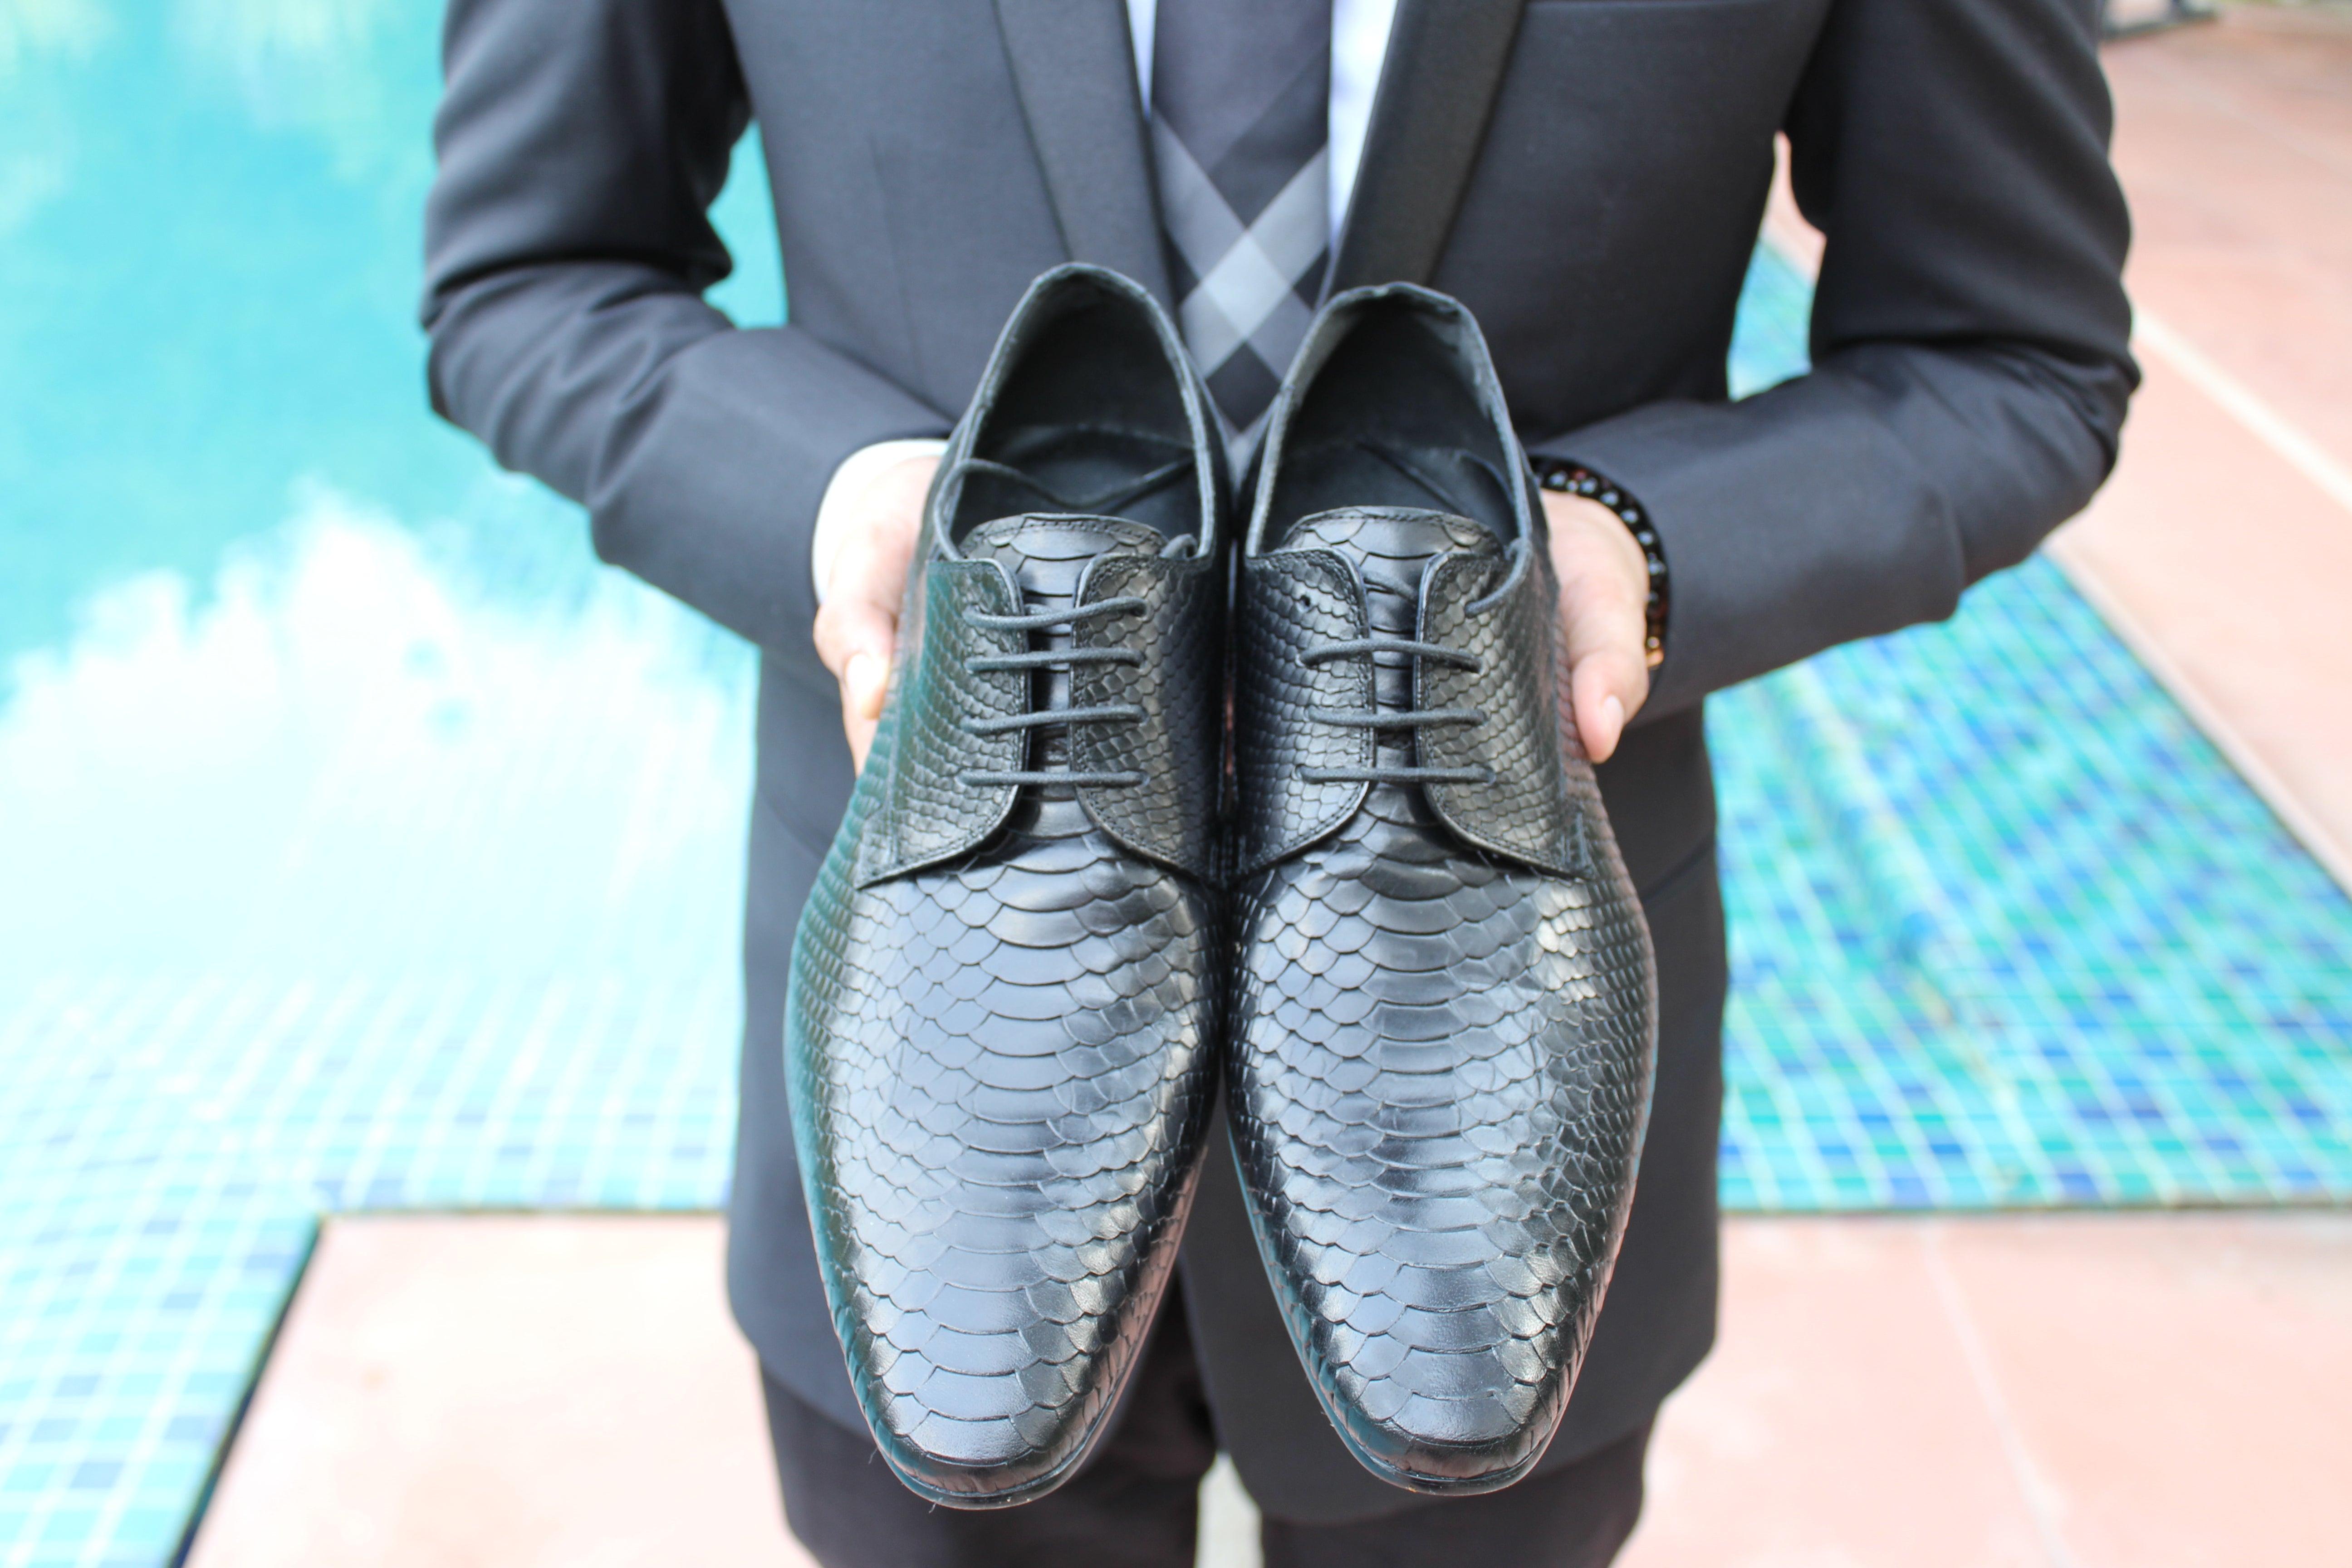 The Best Formal Footwear Options For Men